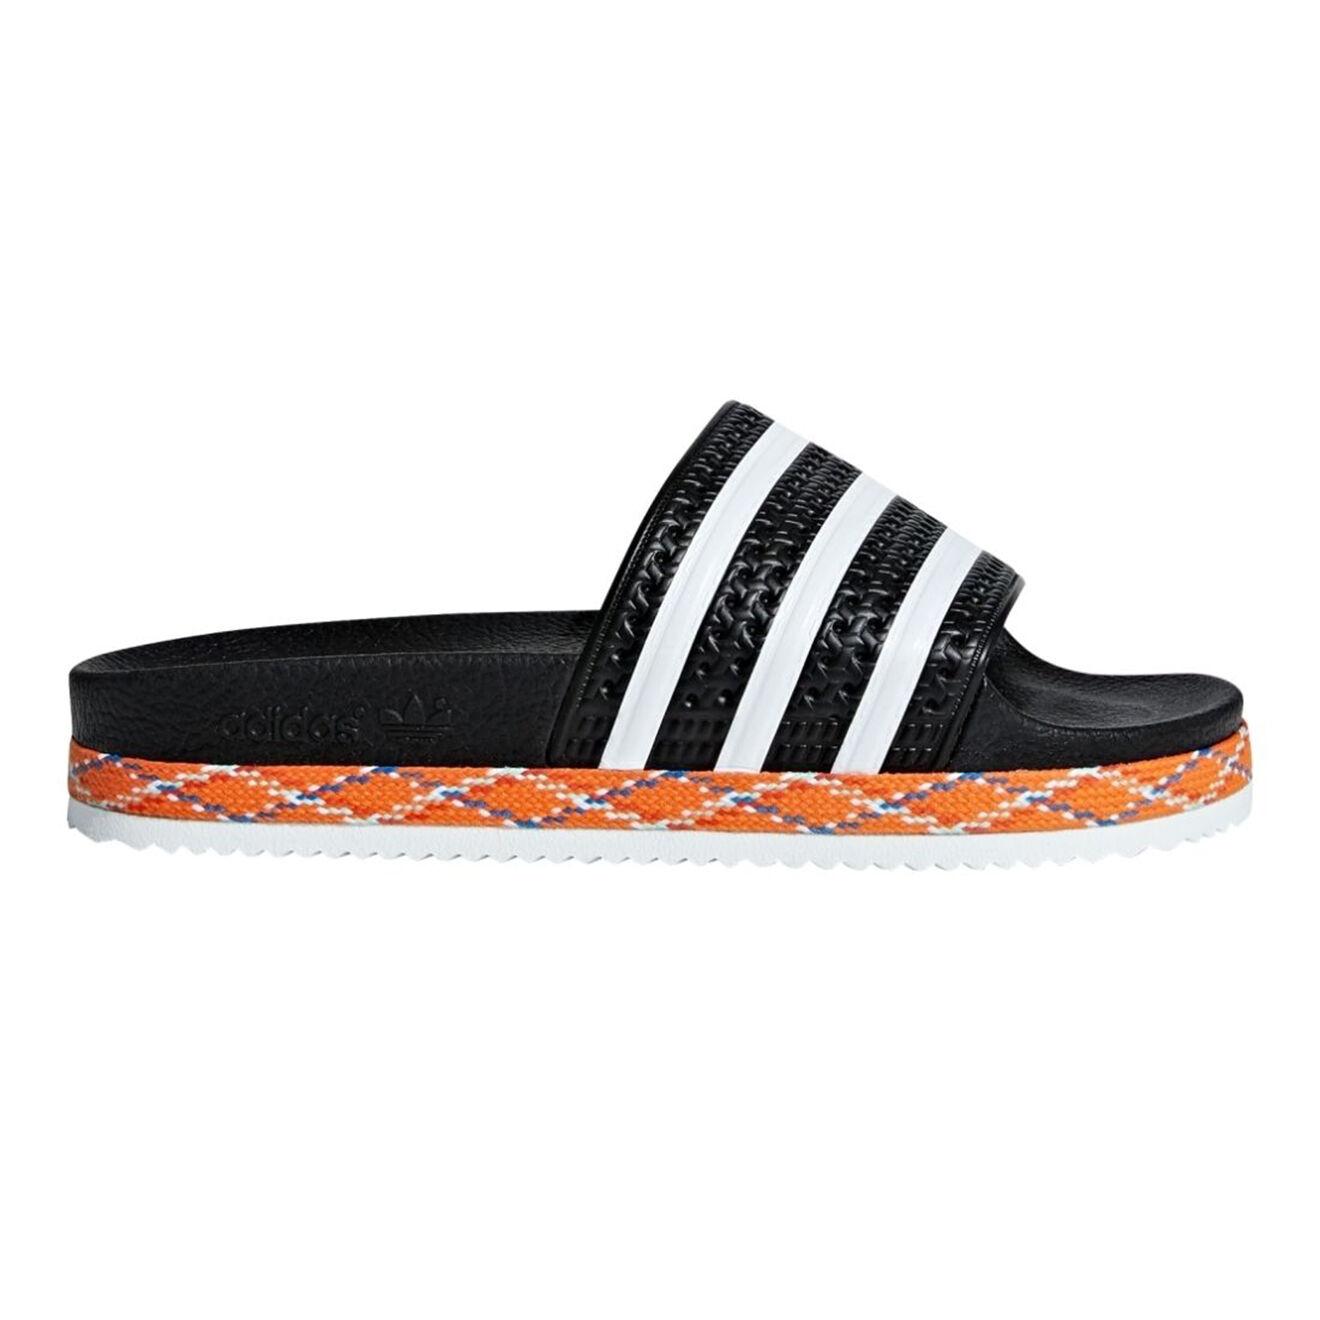 Sandales Adilette noir/blanc - Adidas - Modalova